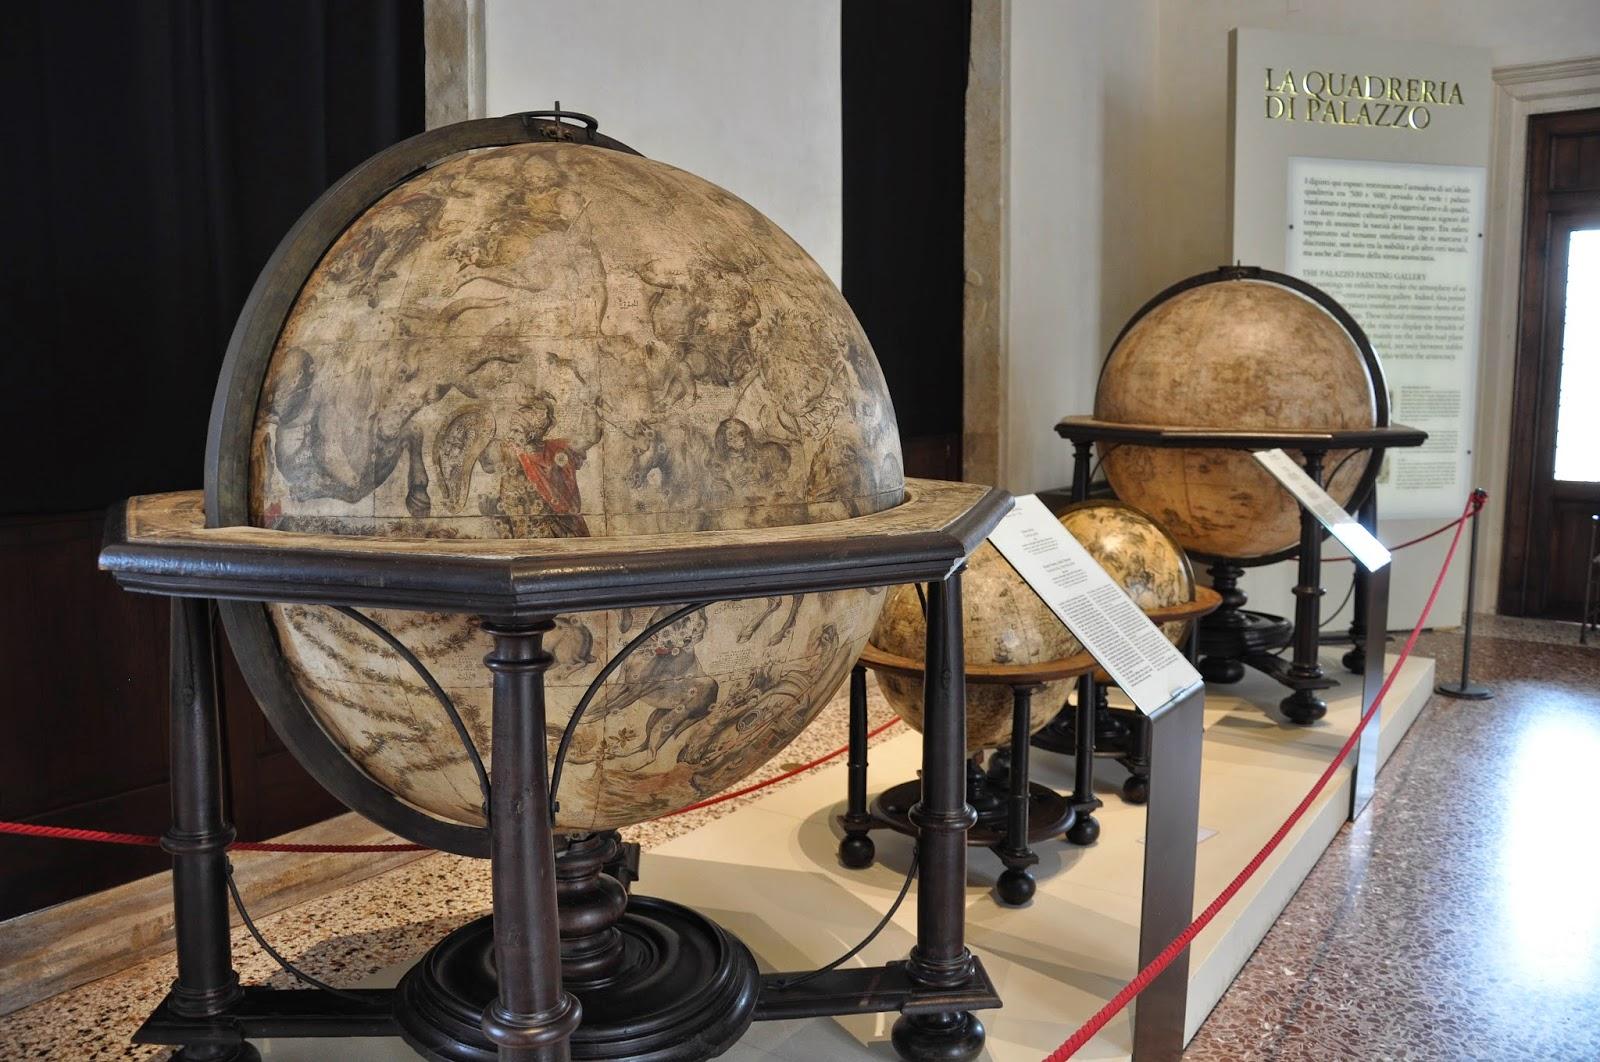 globes main room Civic Art Gallery Palazzo Chiericati Vicenza